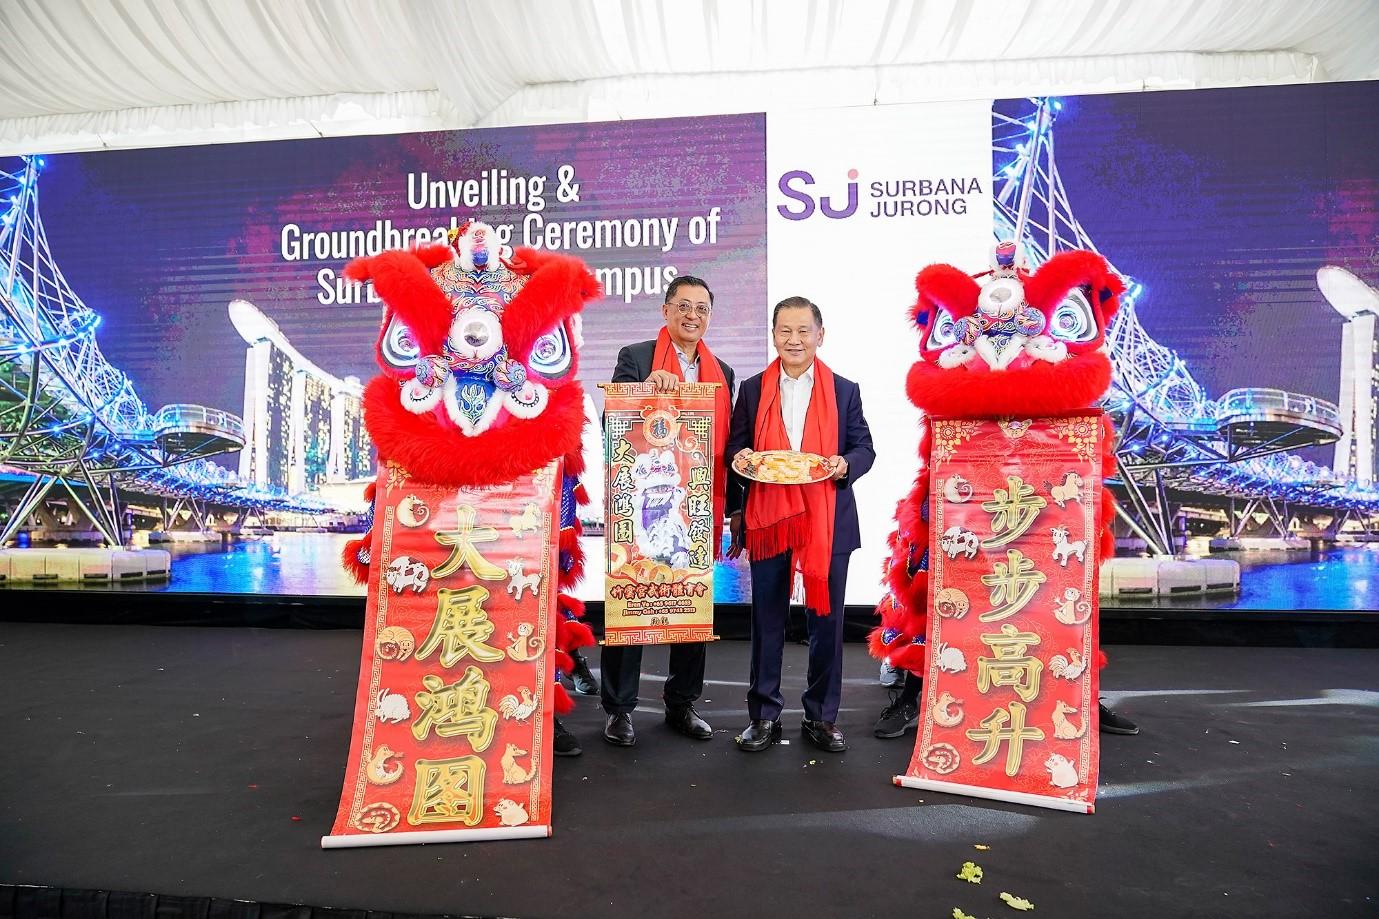 Surbana Jurong Campus Groundbreaking